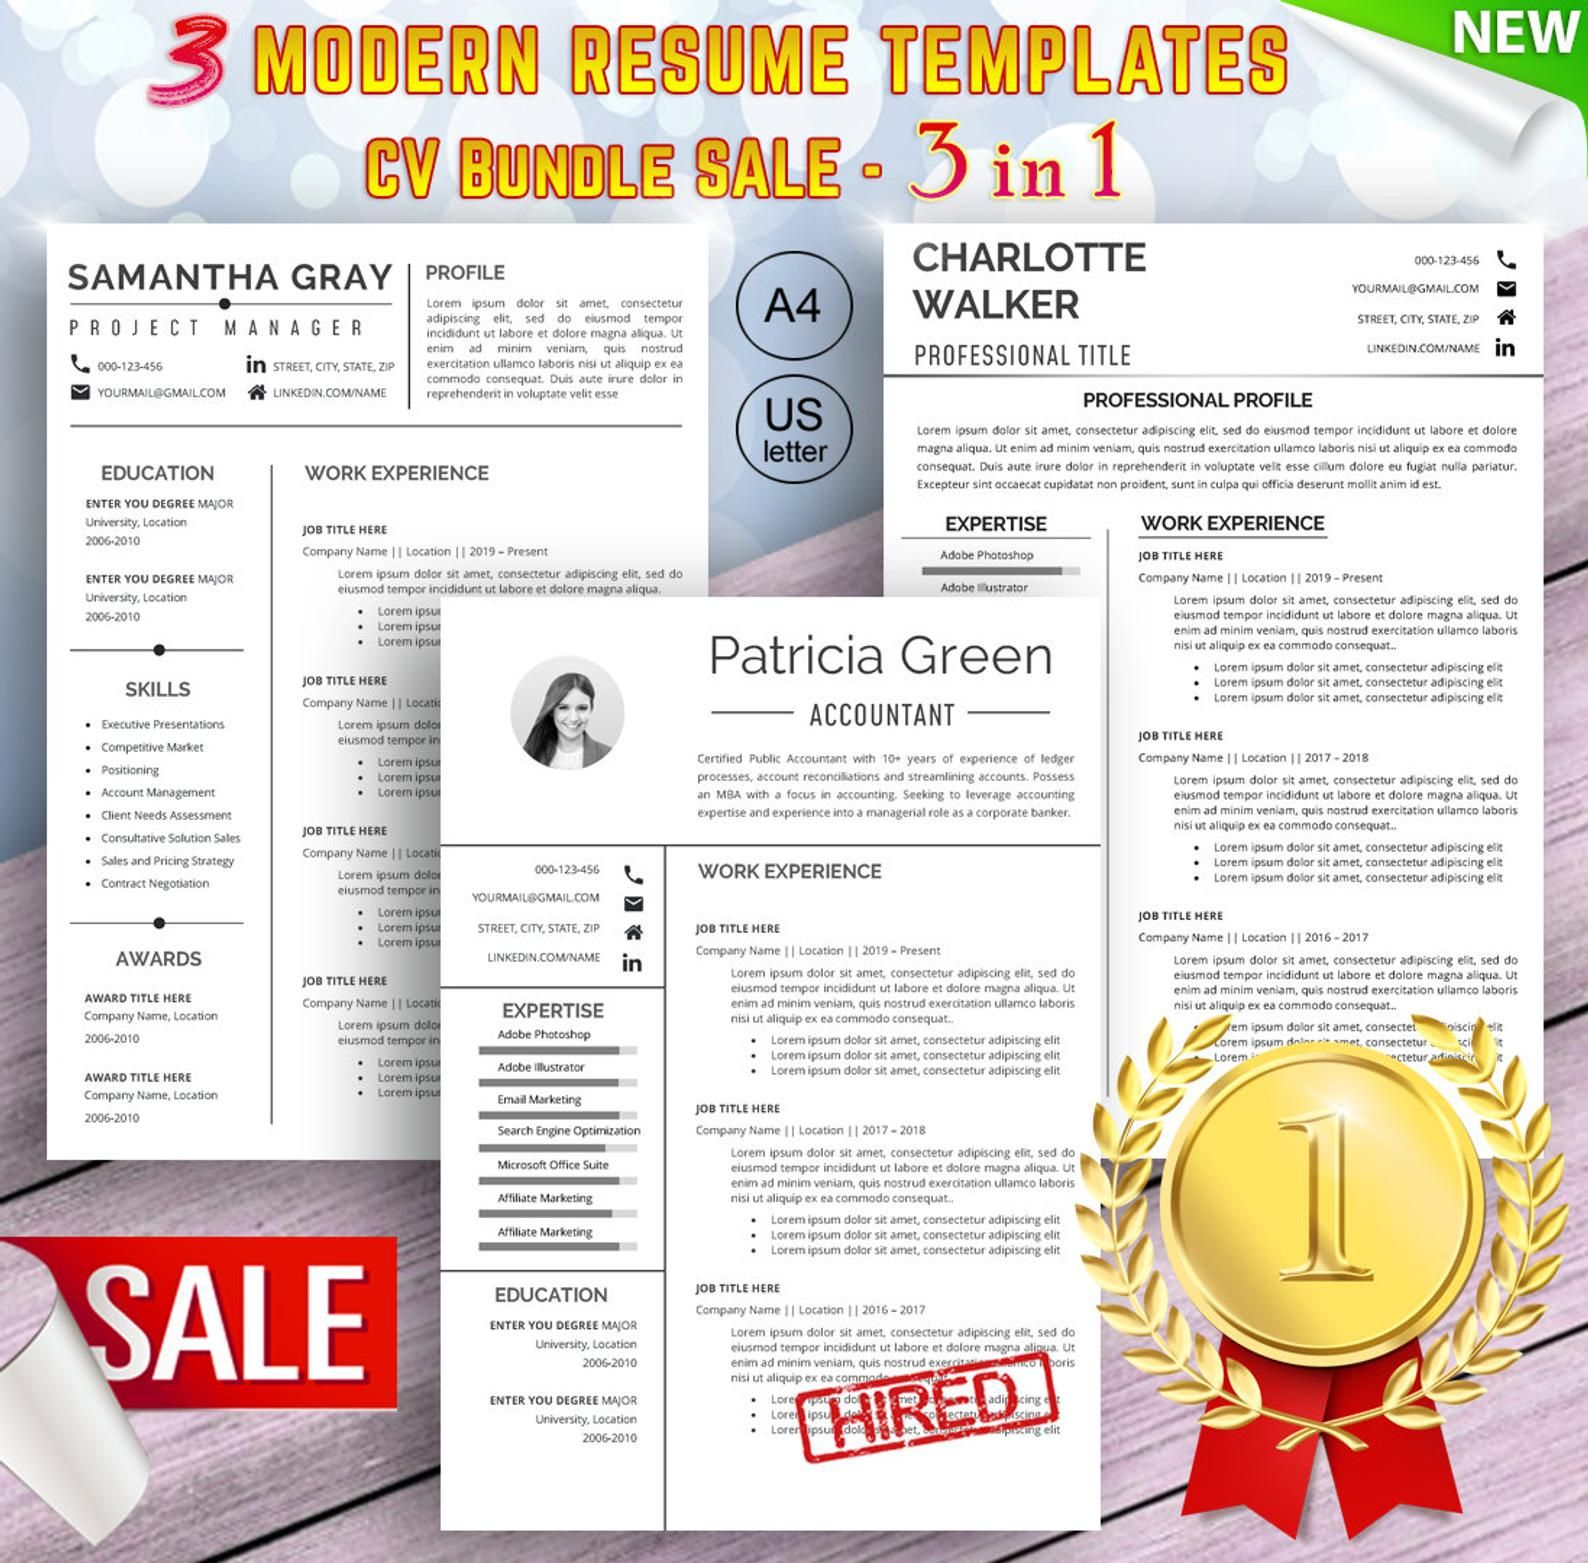 Resume Templates Word CV Template Creative CV Modern